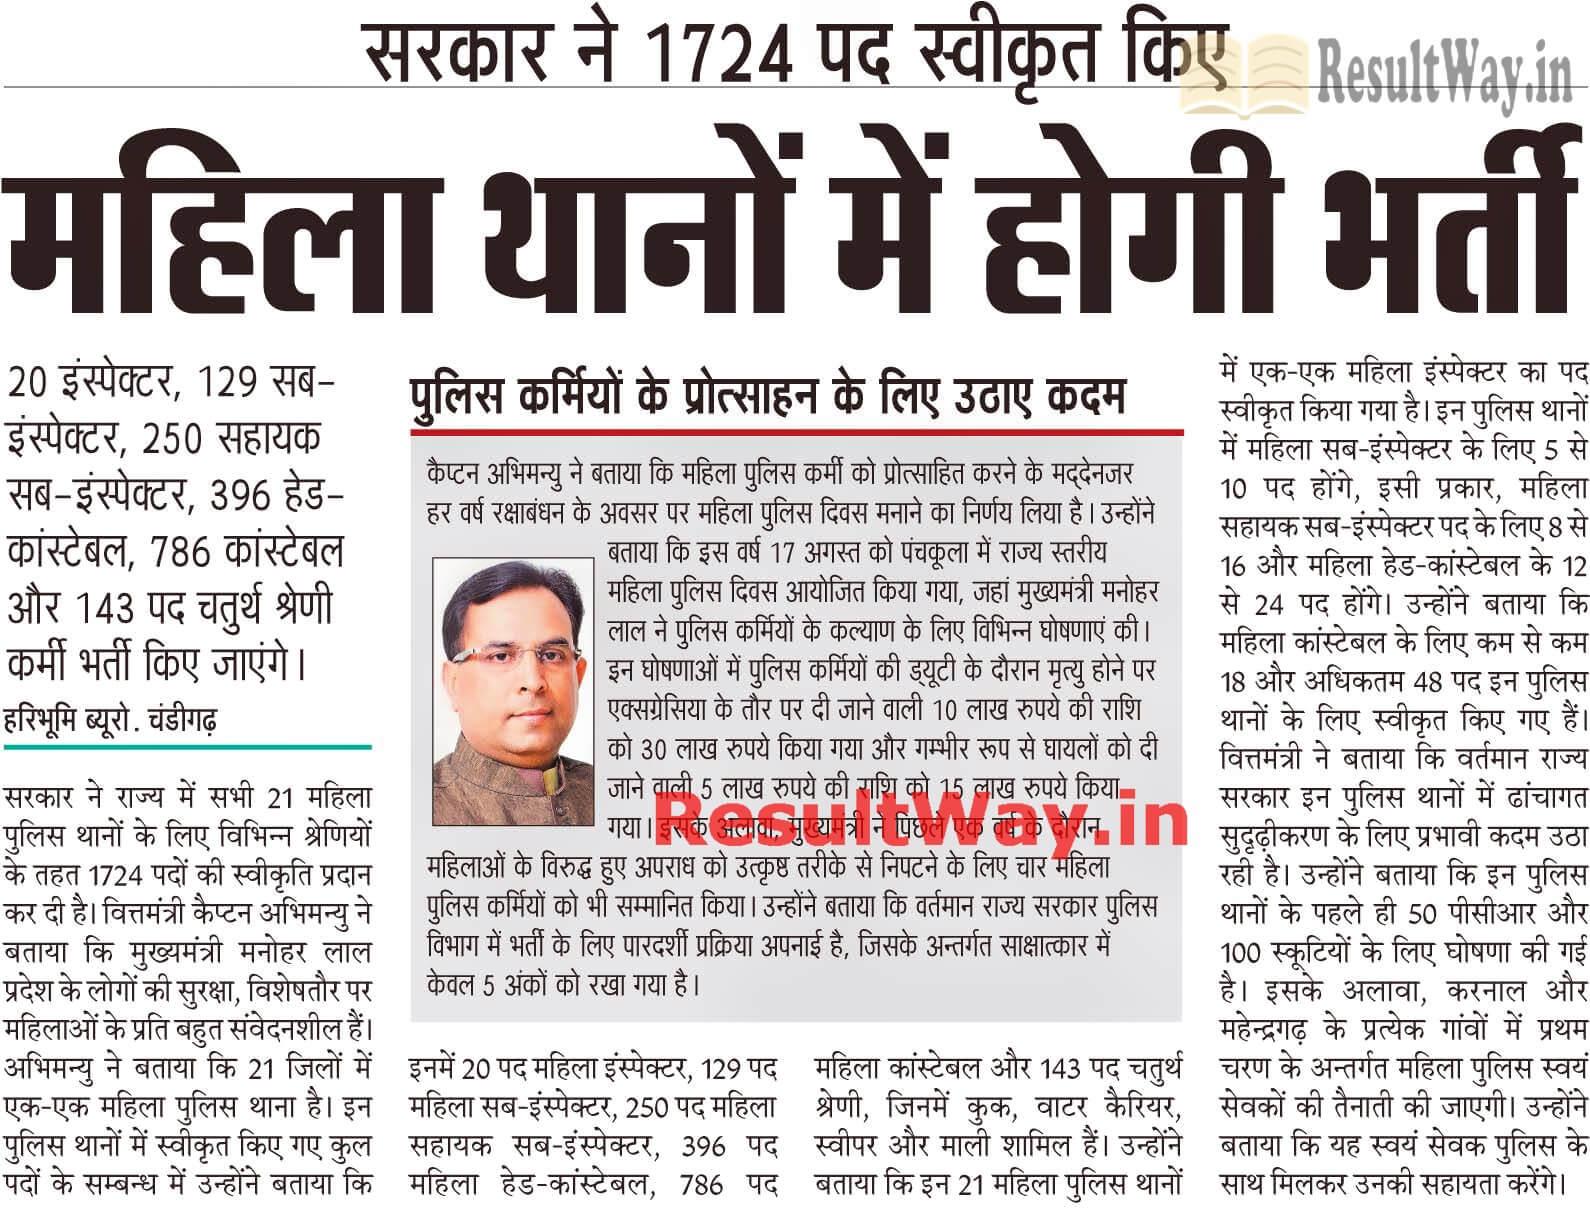 Haryana Police Jobs Female Constables, ASI, SI, Head Constable